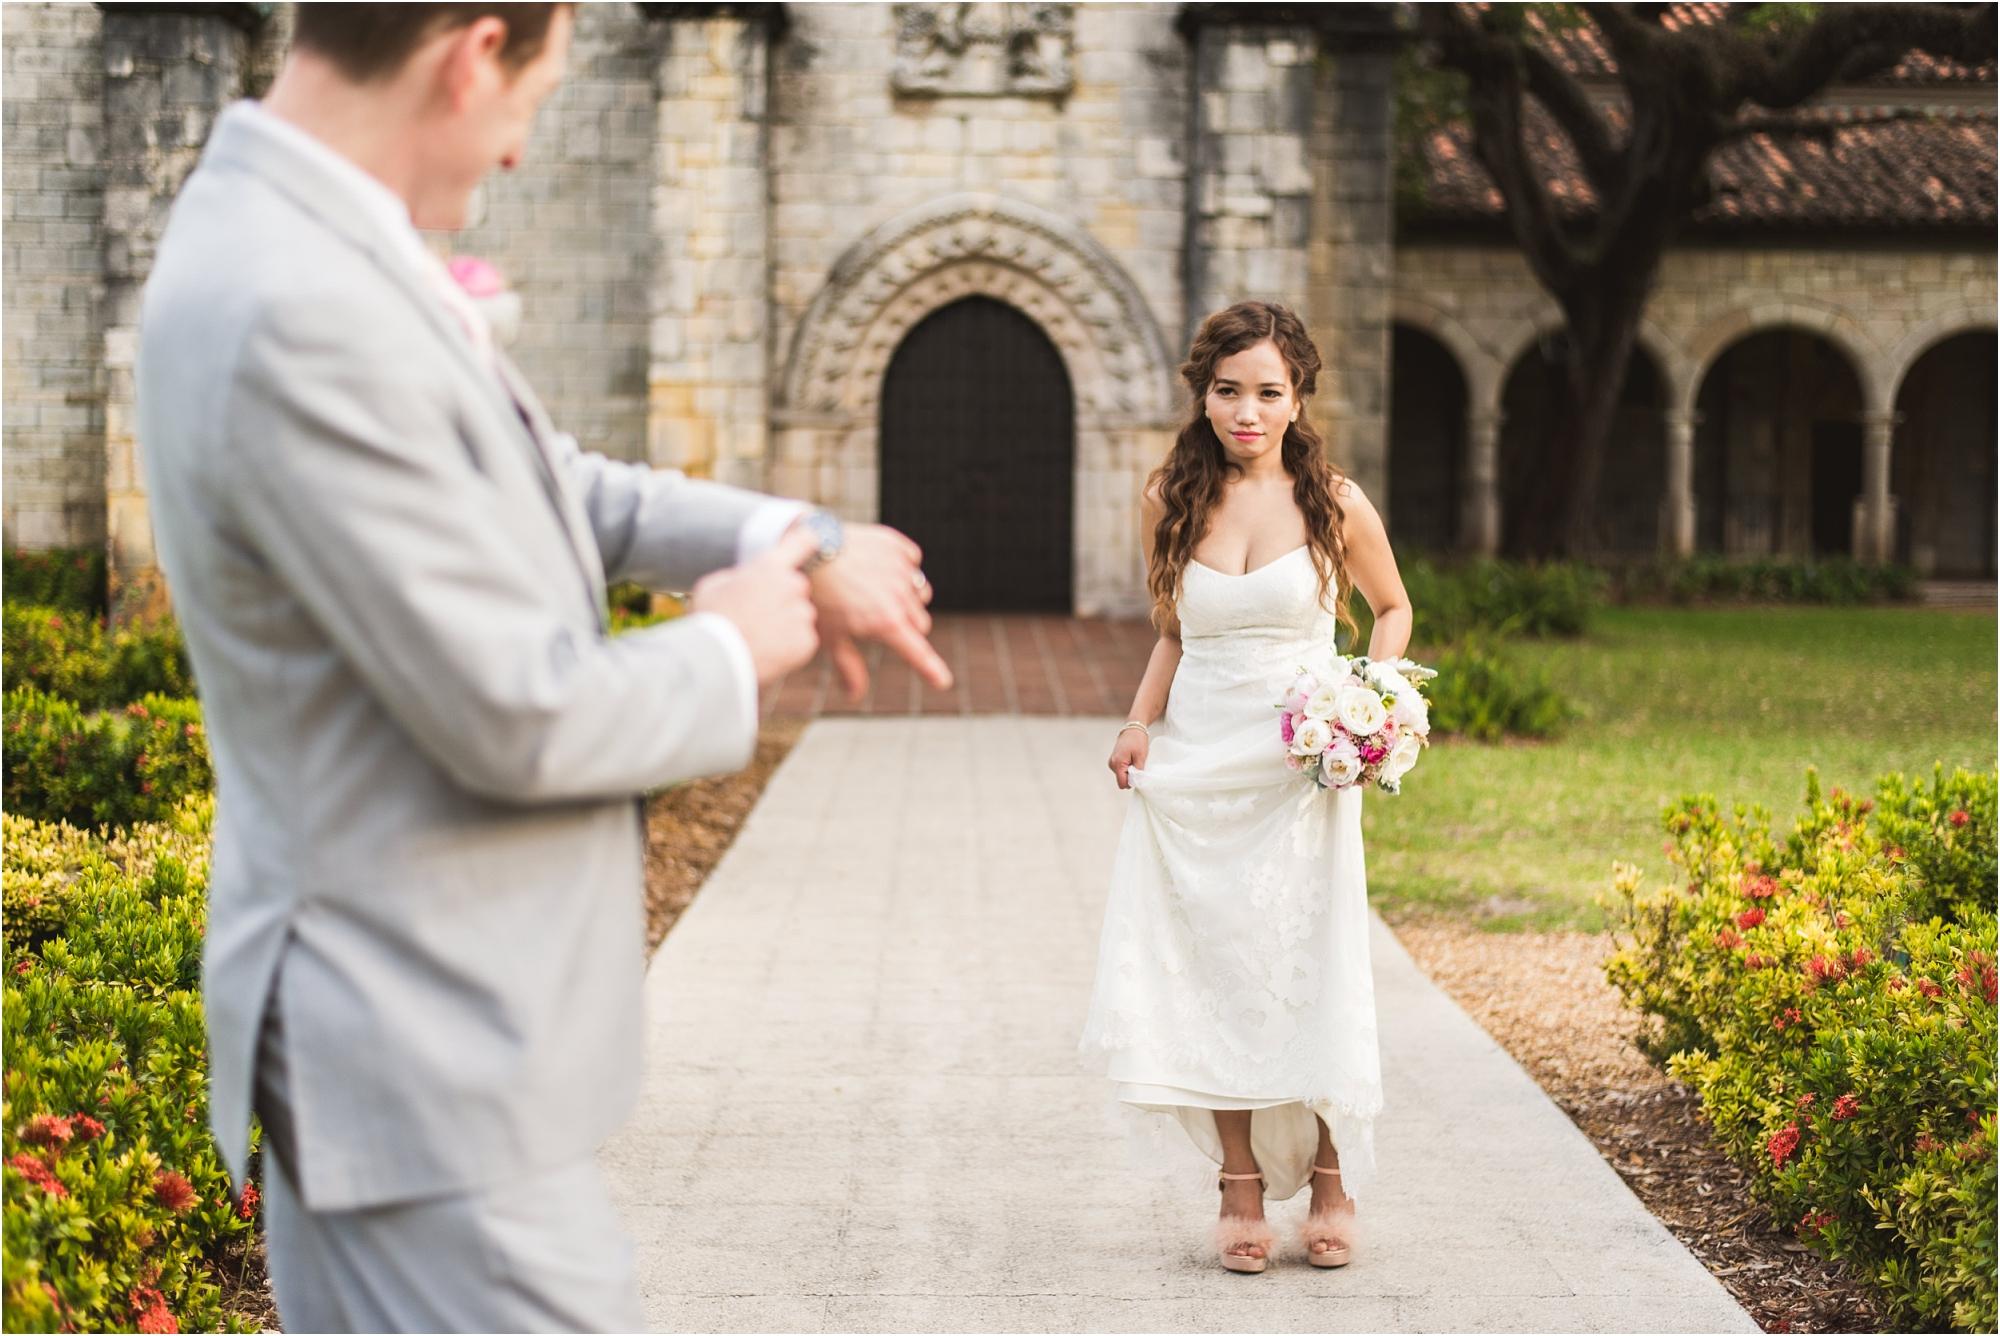 Spanish-Monastery-miami-beach-outdoor-elegant-wedding-photographer-jessenia-gonzalez_1218.jpg